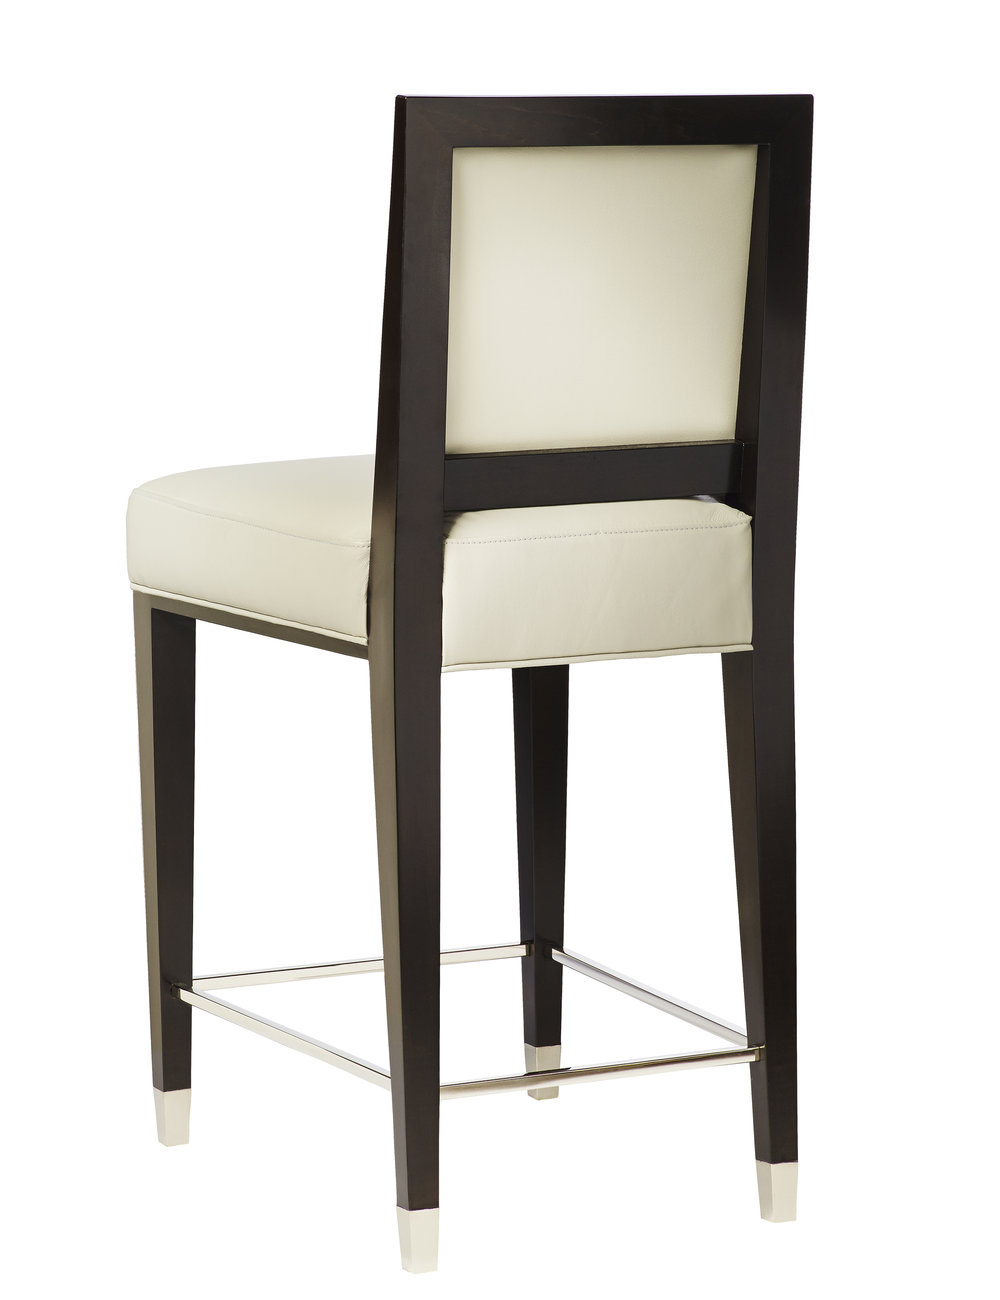 Lola Bar ChairBack V3.jpg